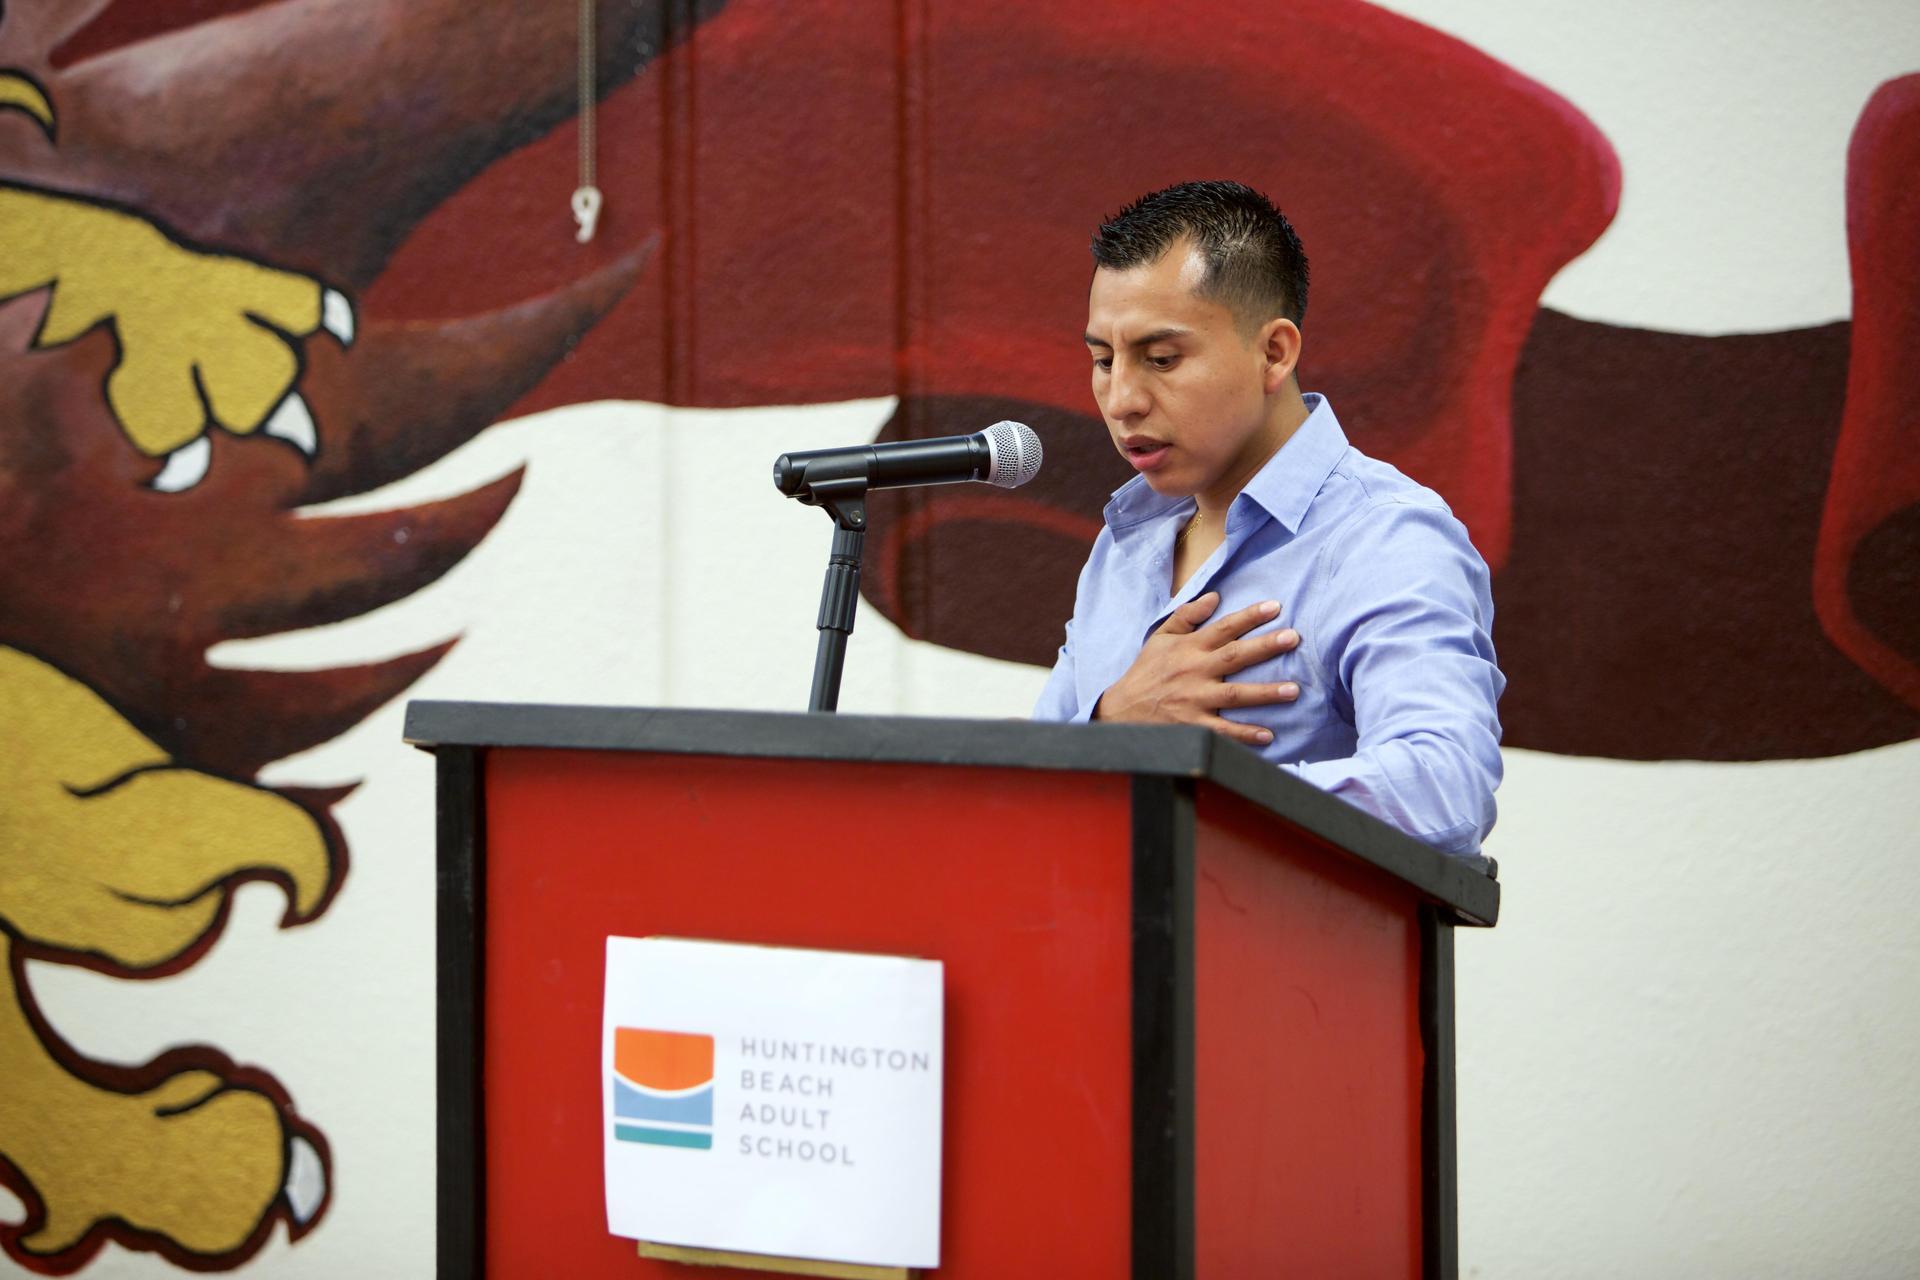 Gerardio Lopez leads the Pledge of Allegiance